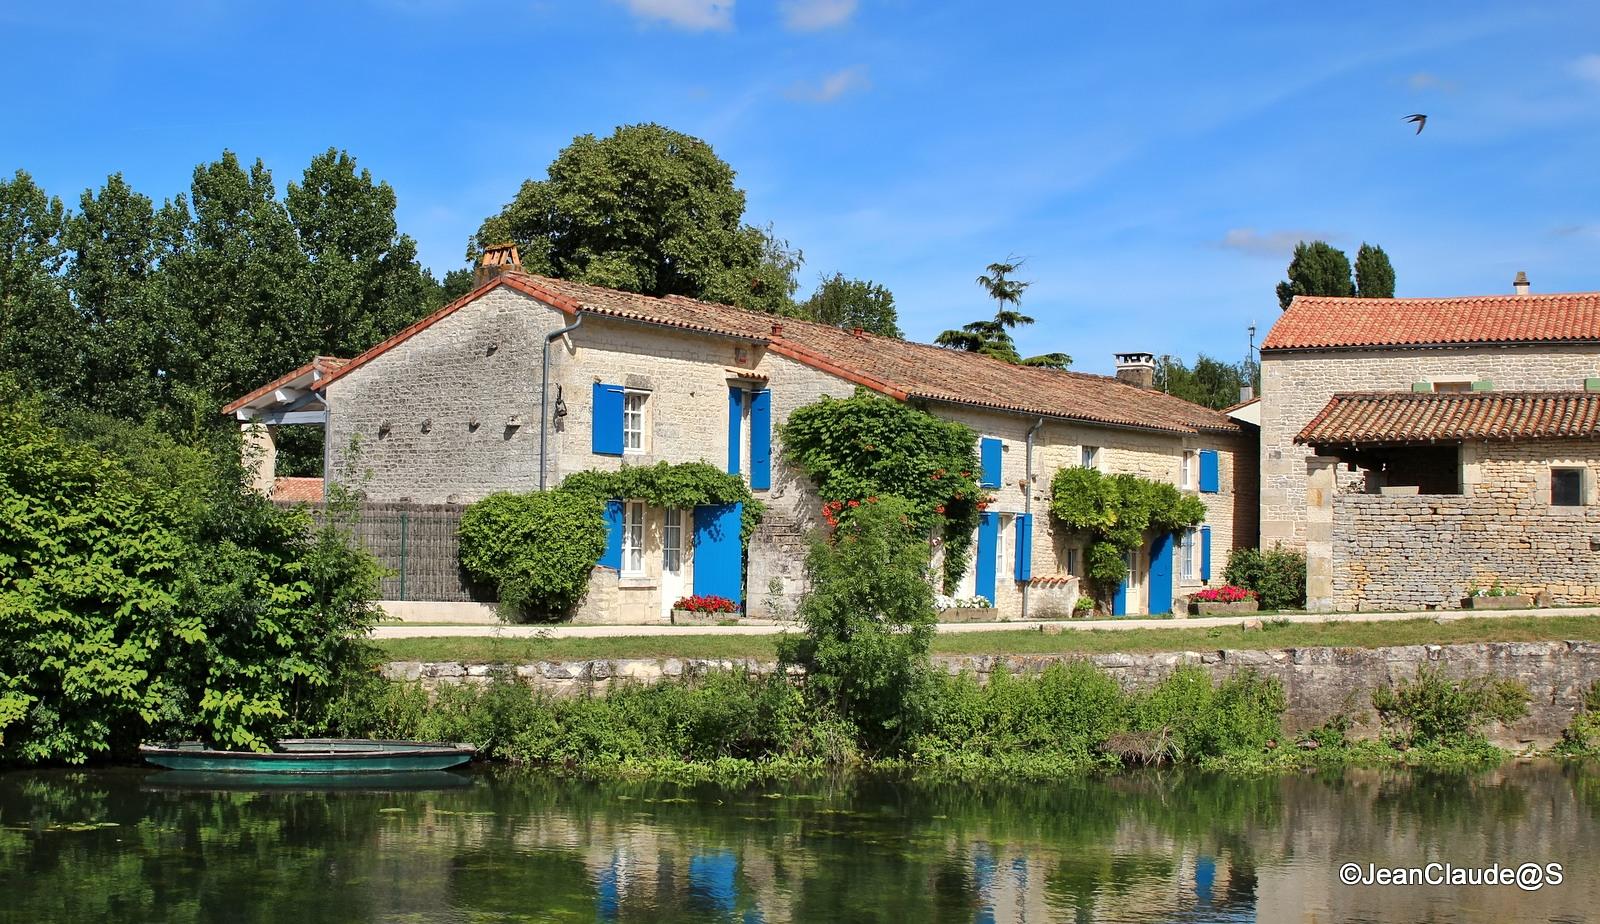 Le Marais Poitevin Img_0555_filtered-529c499